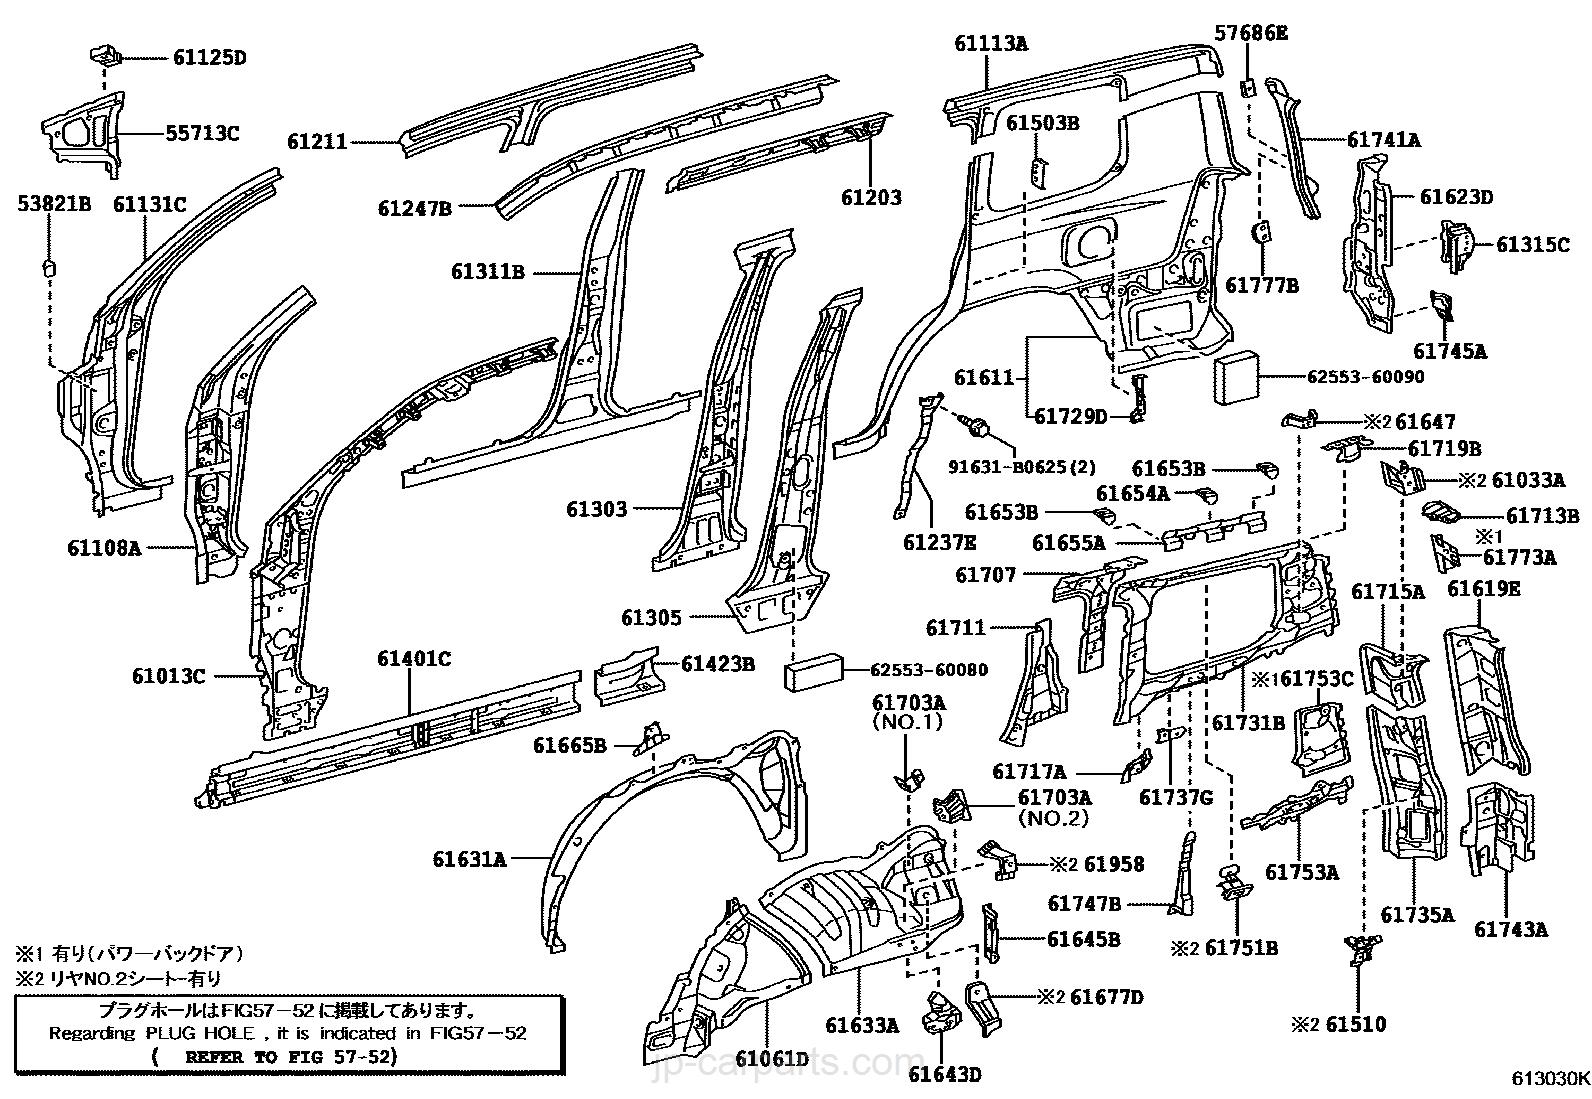 Inner Right Rear Genuine Hyundai 83920-2D200-OH Door Frame Cover Assembly